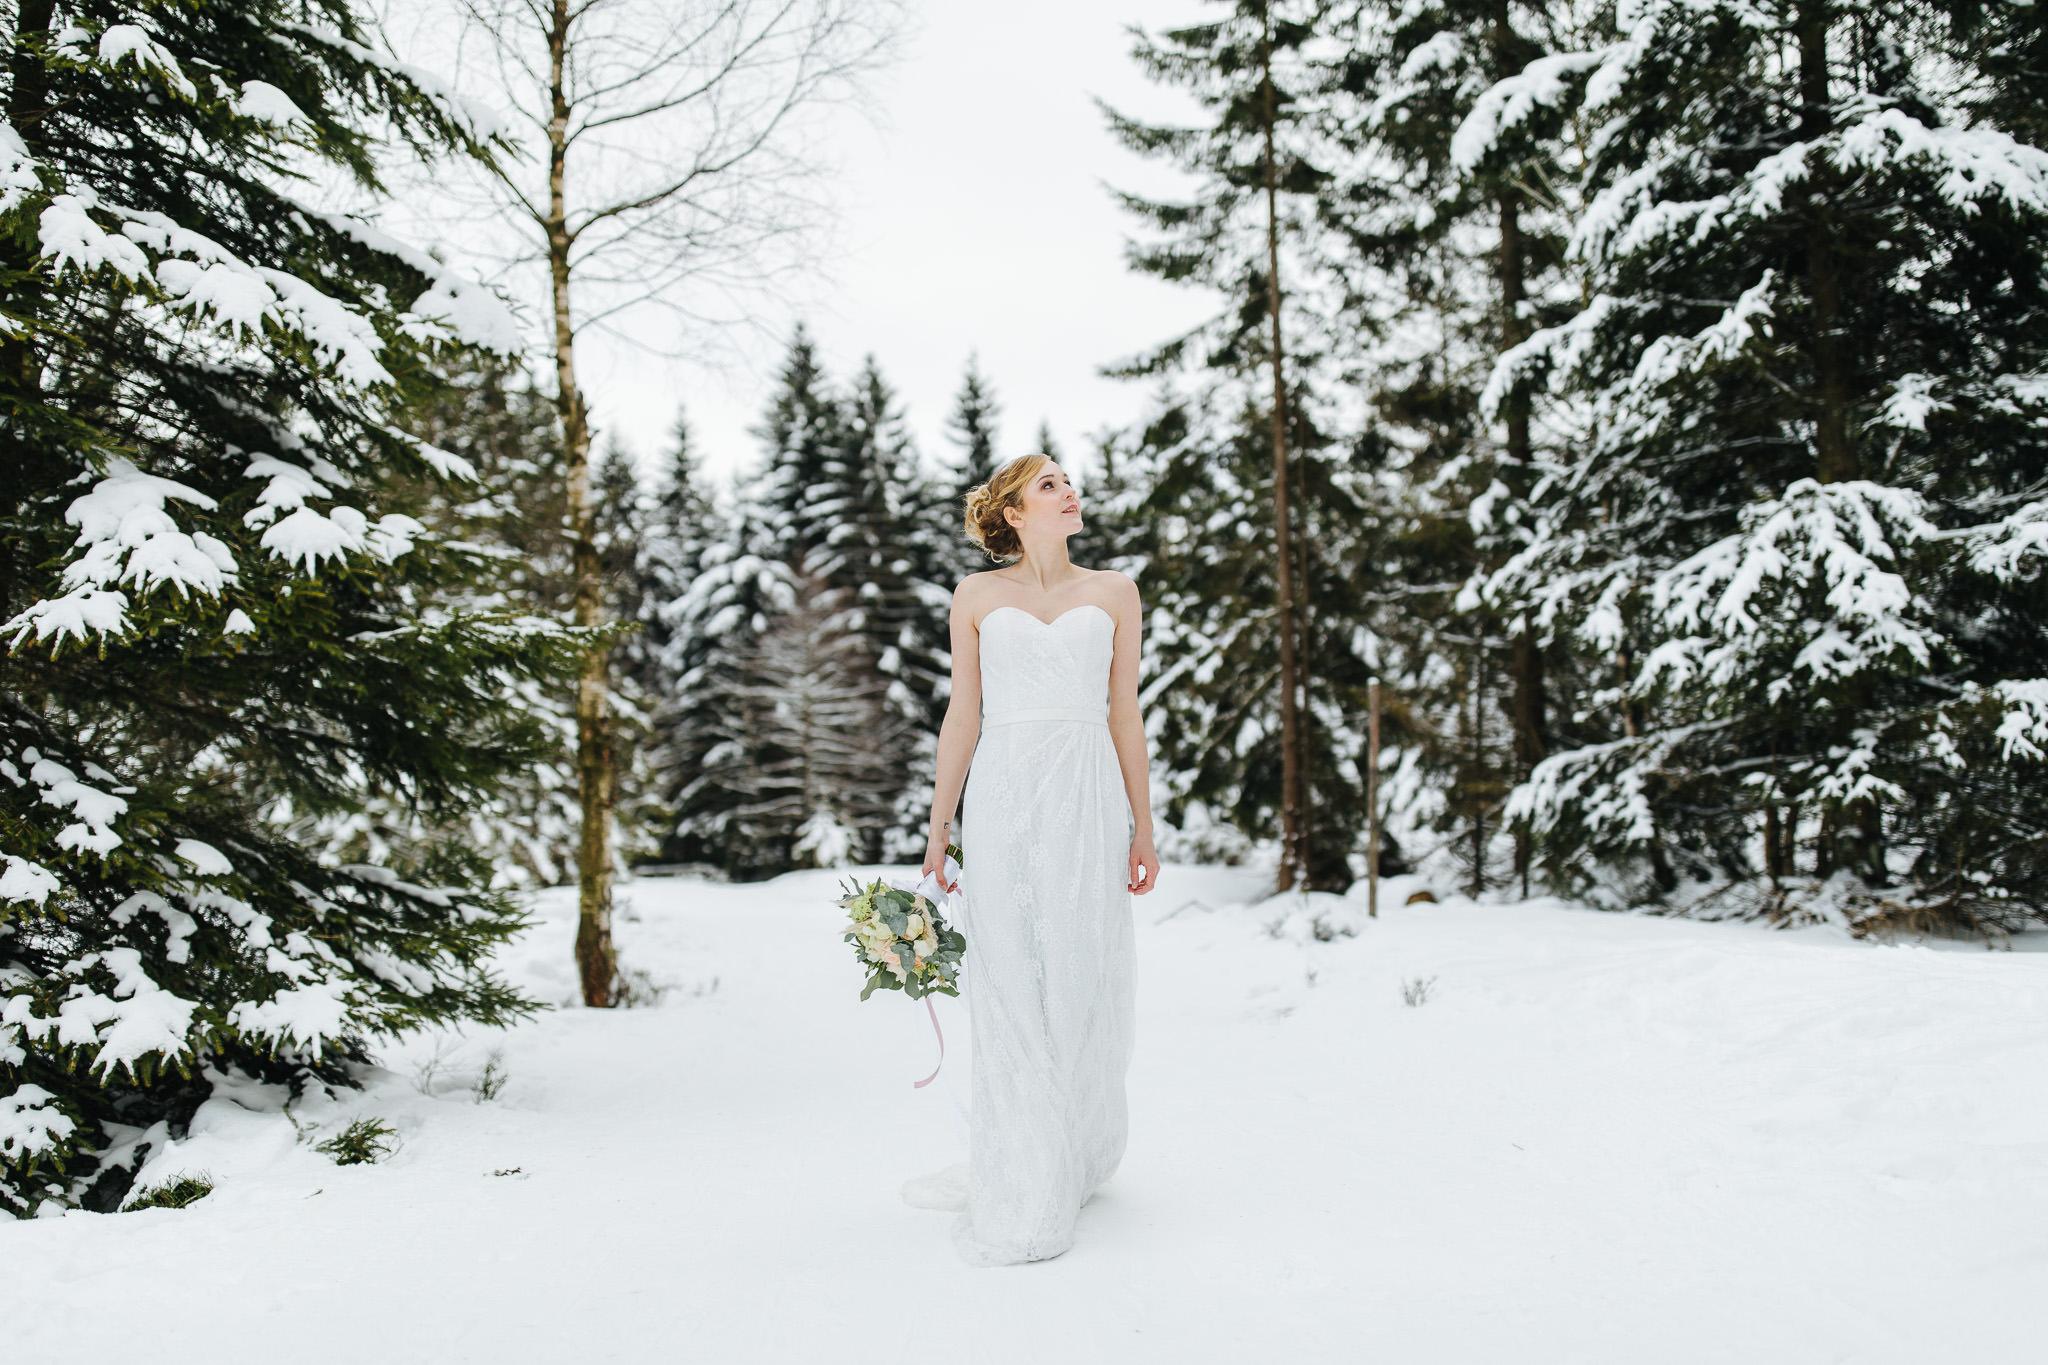 Winterinspiration 36